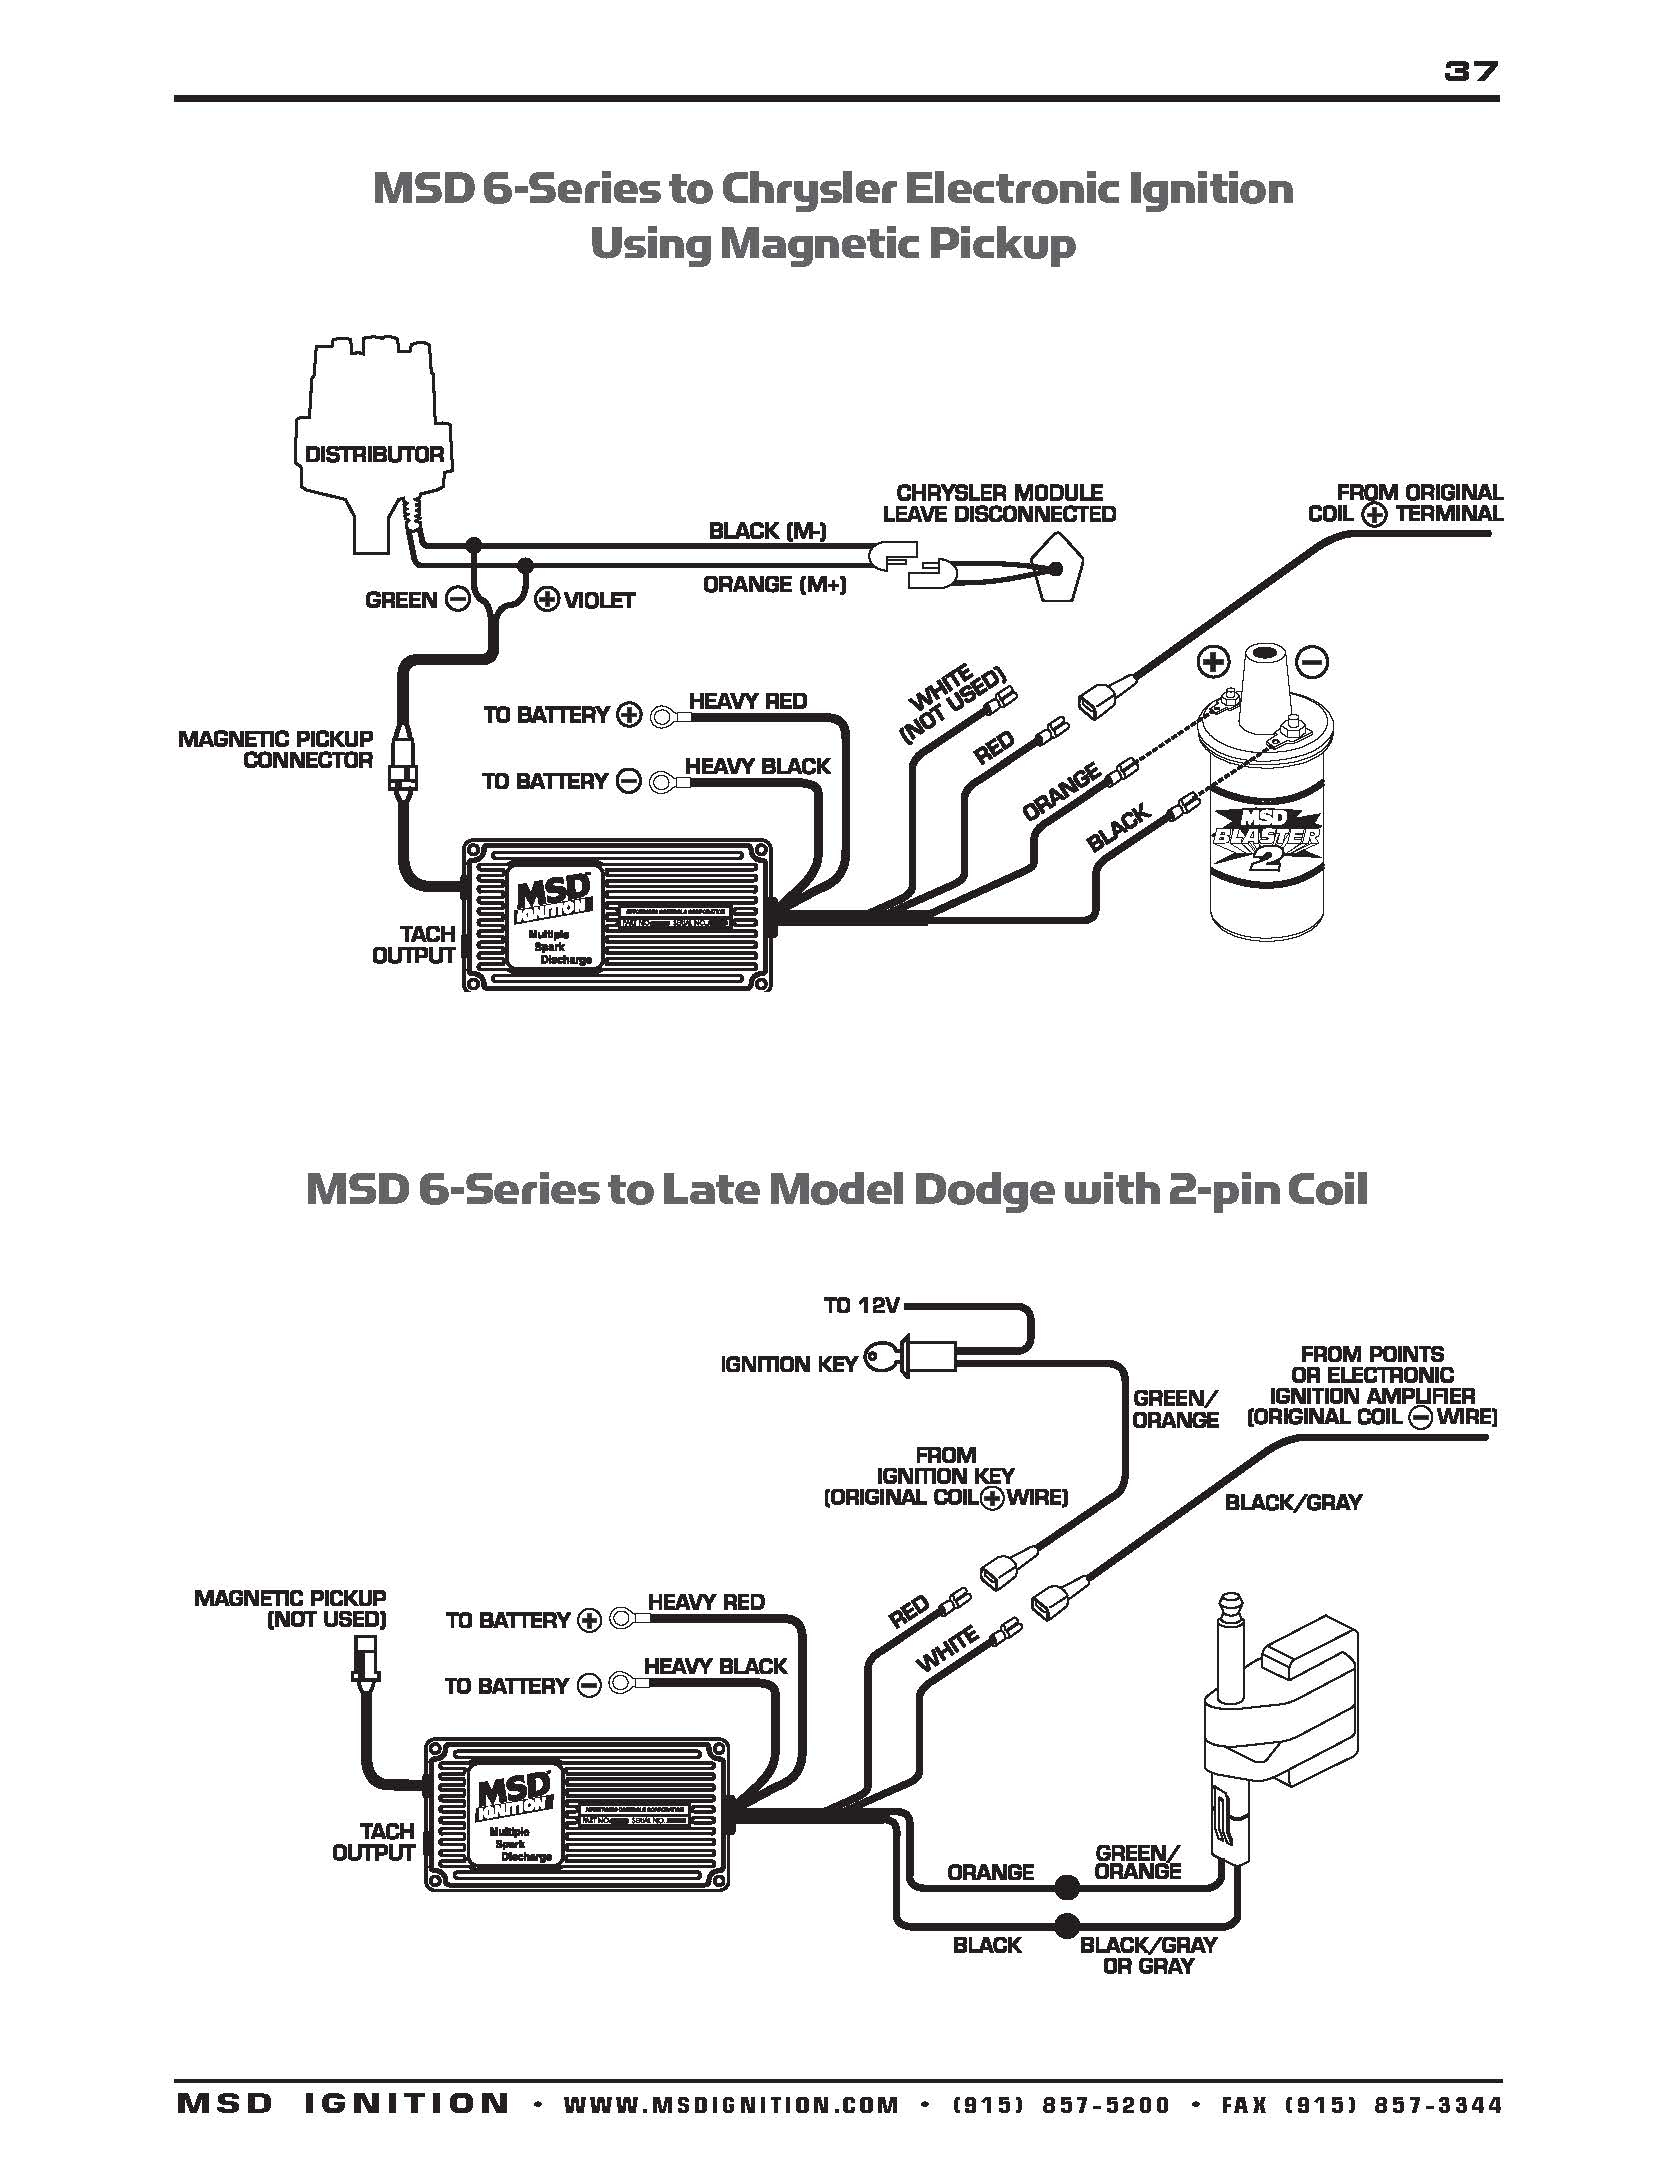 Msd Ignition 6Al Wiring Diagram Chevy   Manual E-Books - Msd Ignition Wiring Diagram Chevy